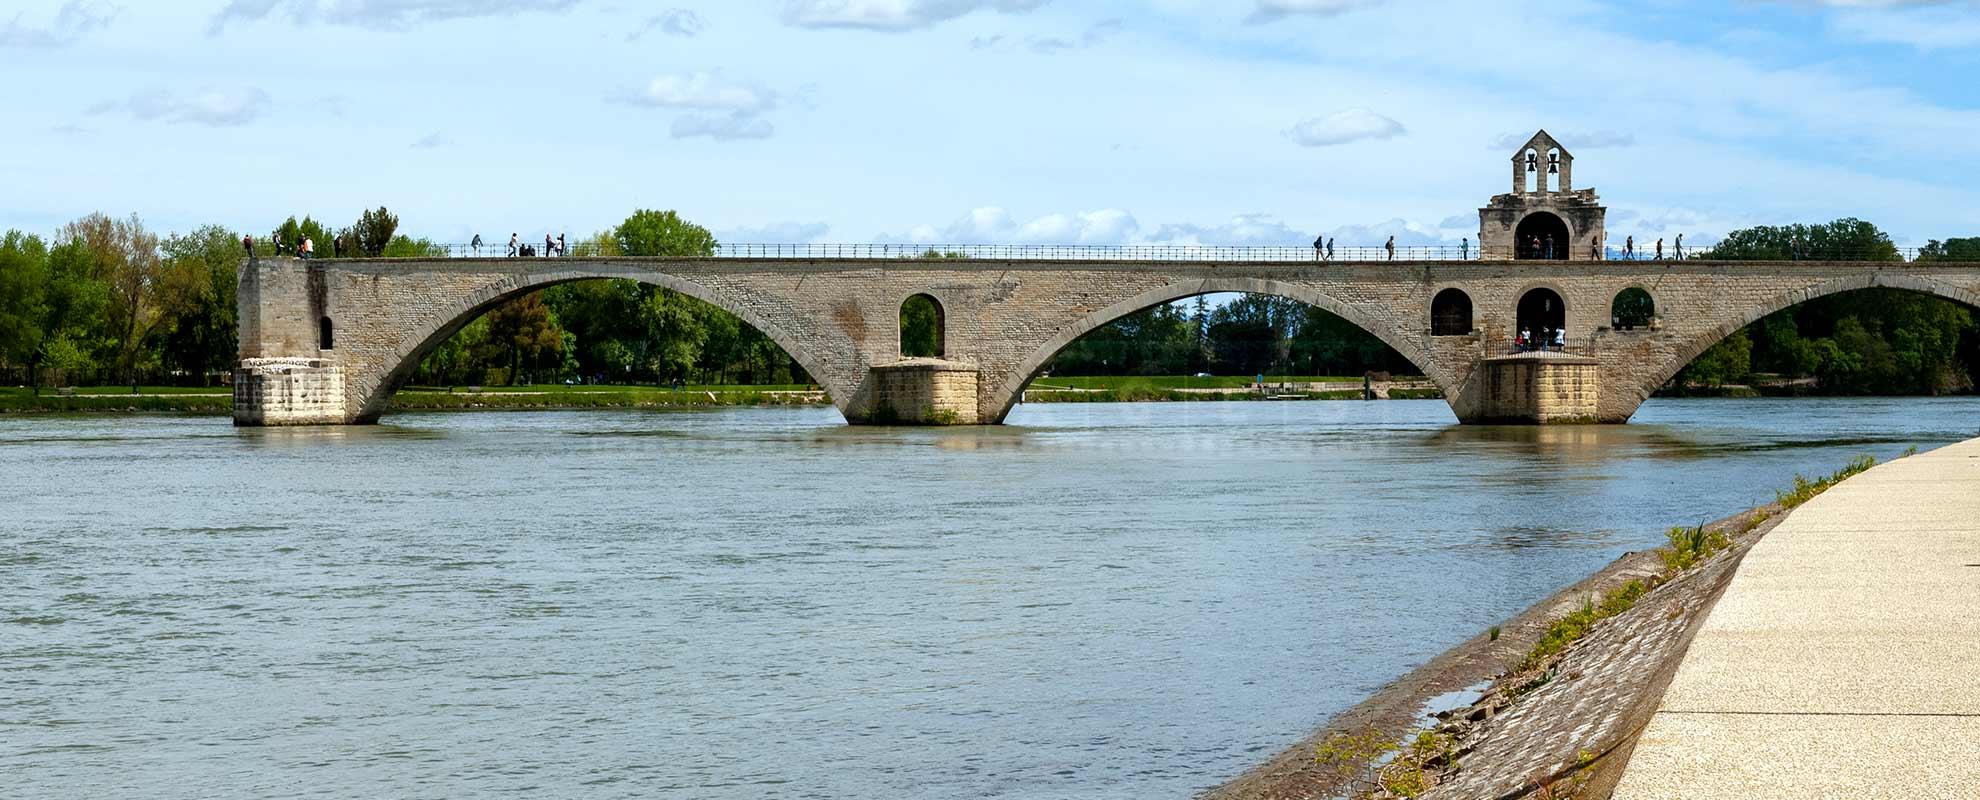 Avignon Papal Bridge and the river Rhone